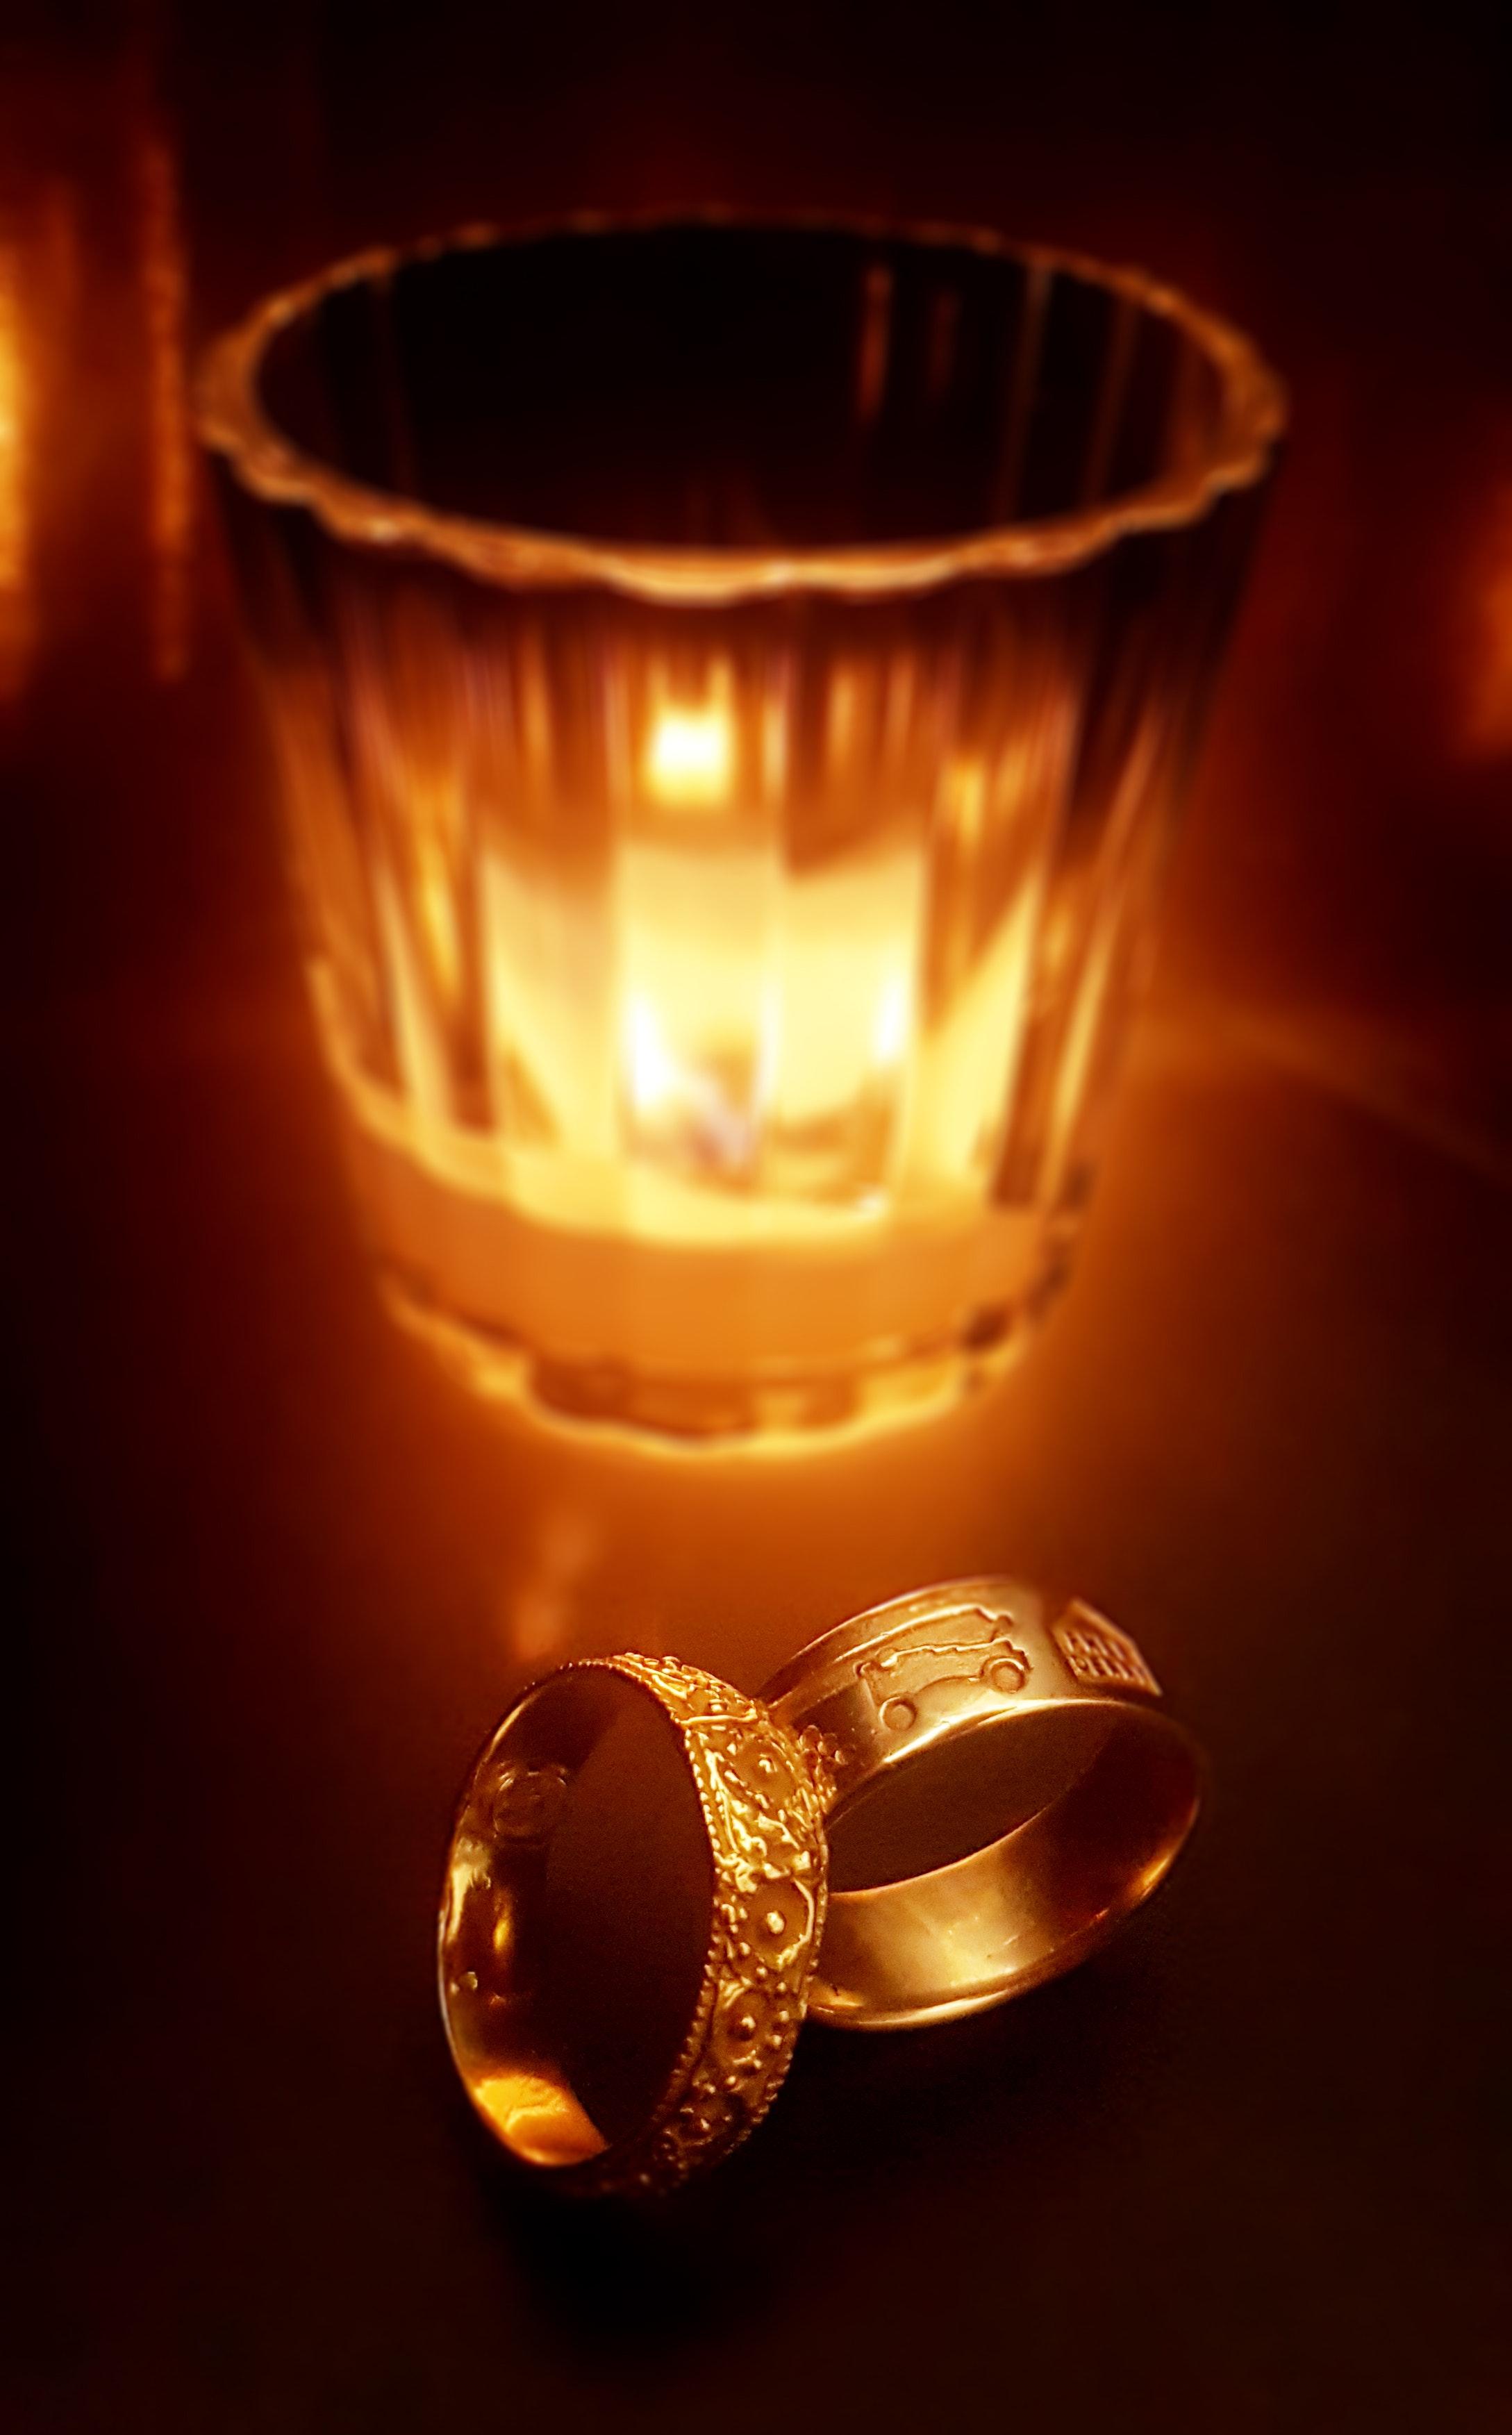 3 Gold Wedding Ring, Luxury, Love, Rings, Light, HQ Photo